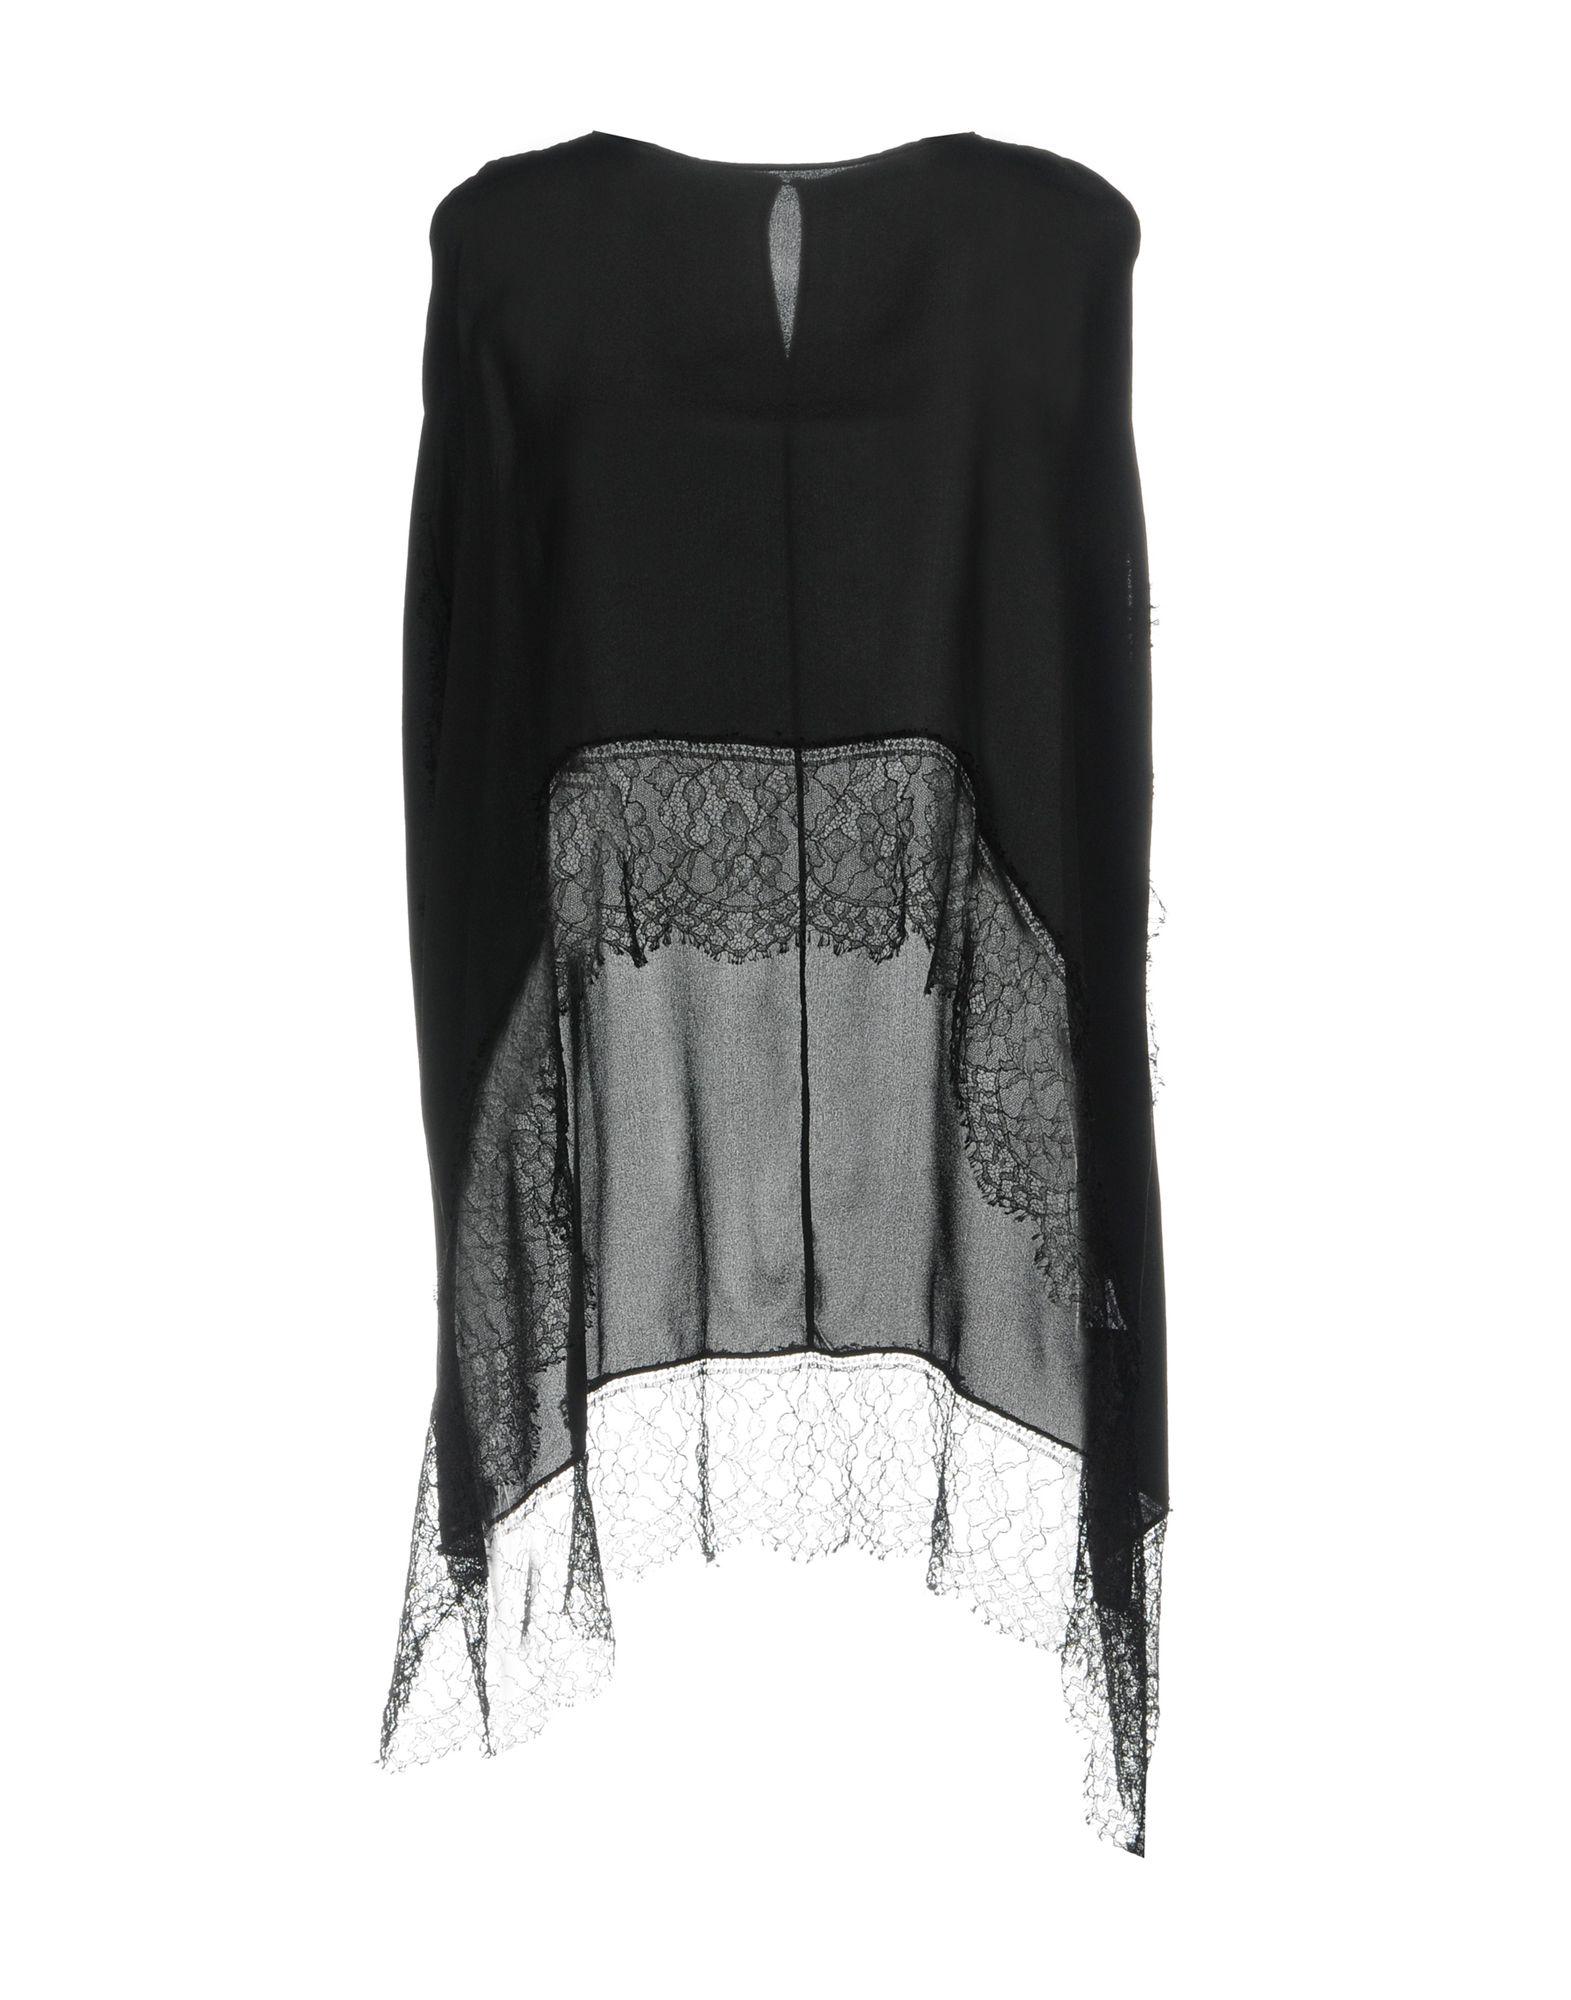 MONICA SARTI Blouse in Black